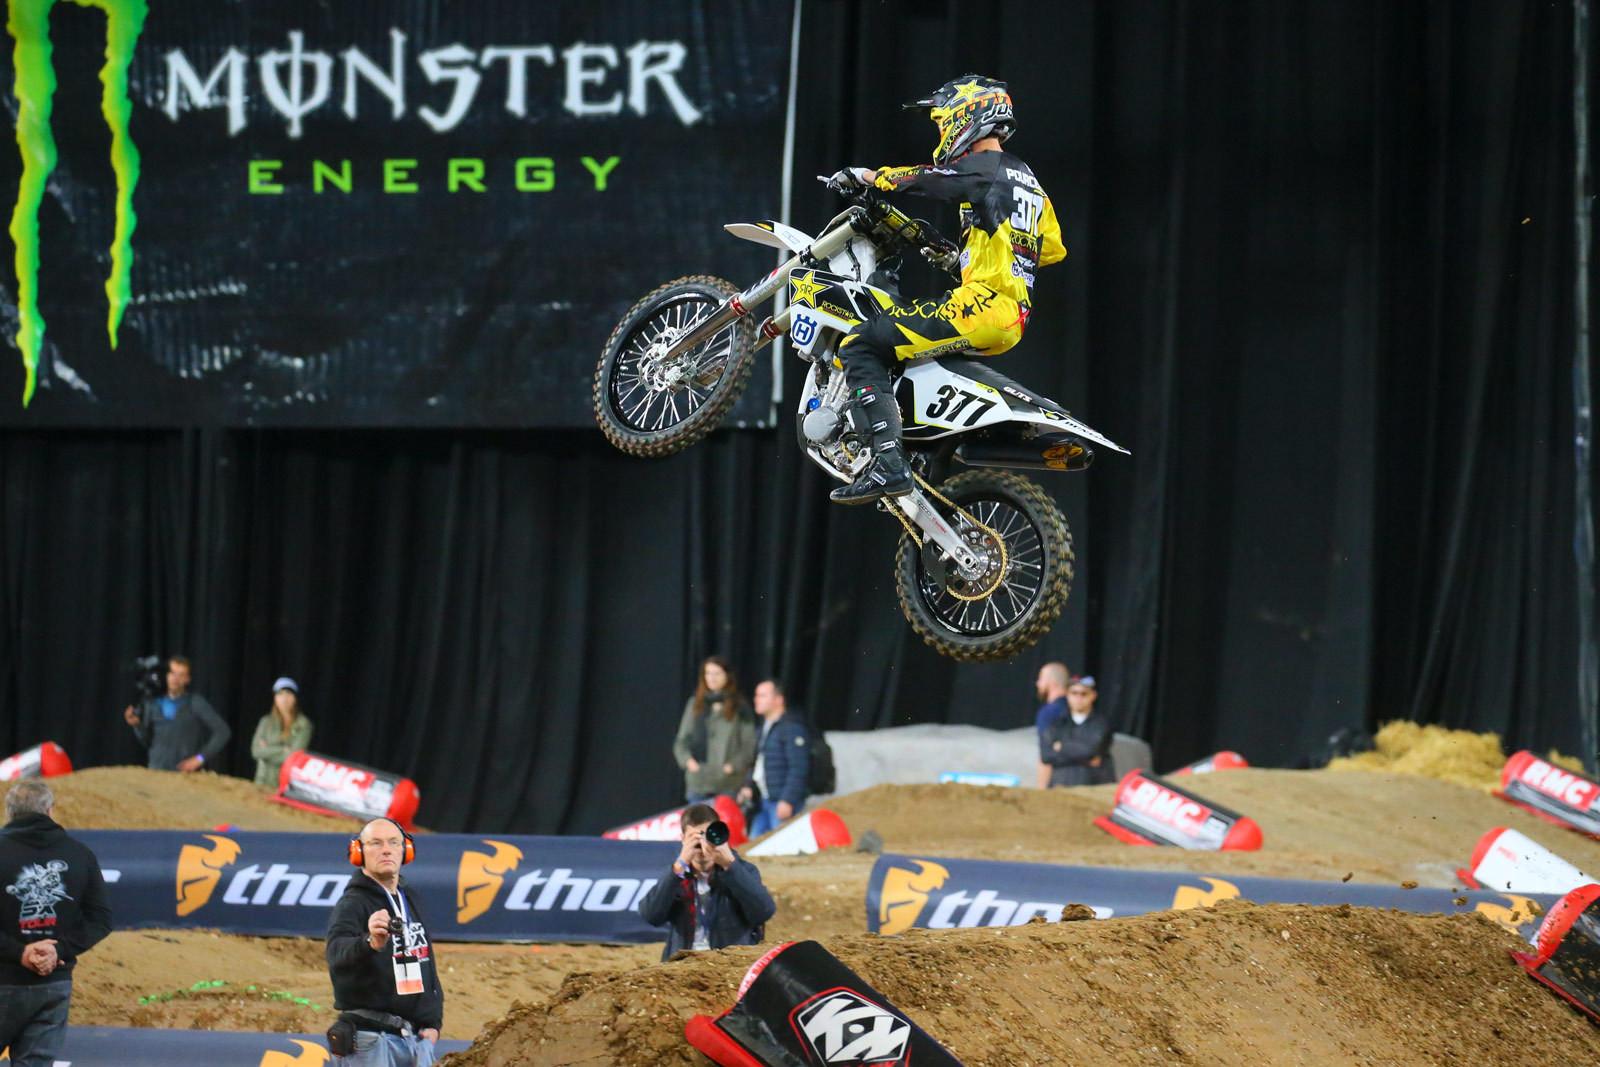 Christophe Pourcel - Supercross Paris-Lille: Press Day - Motocross Pictures - Vital MX